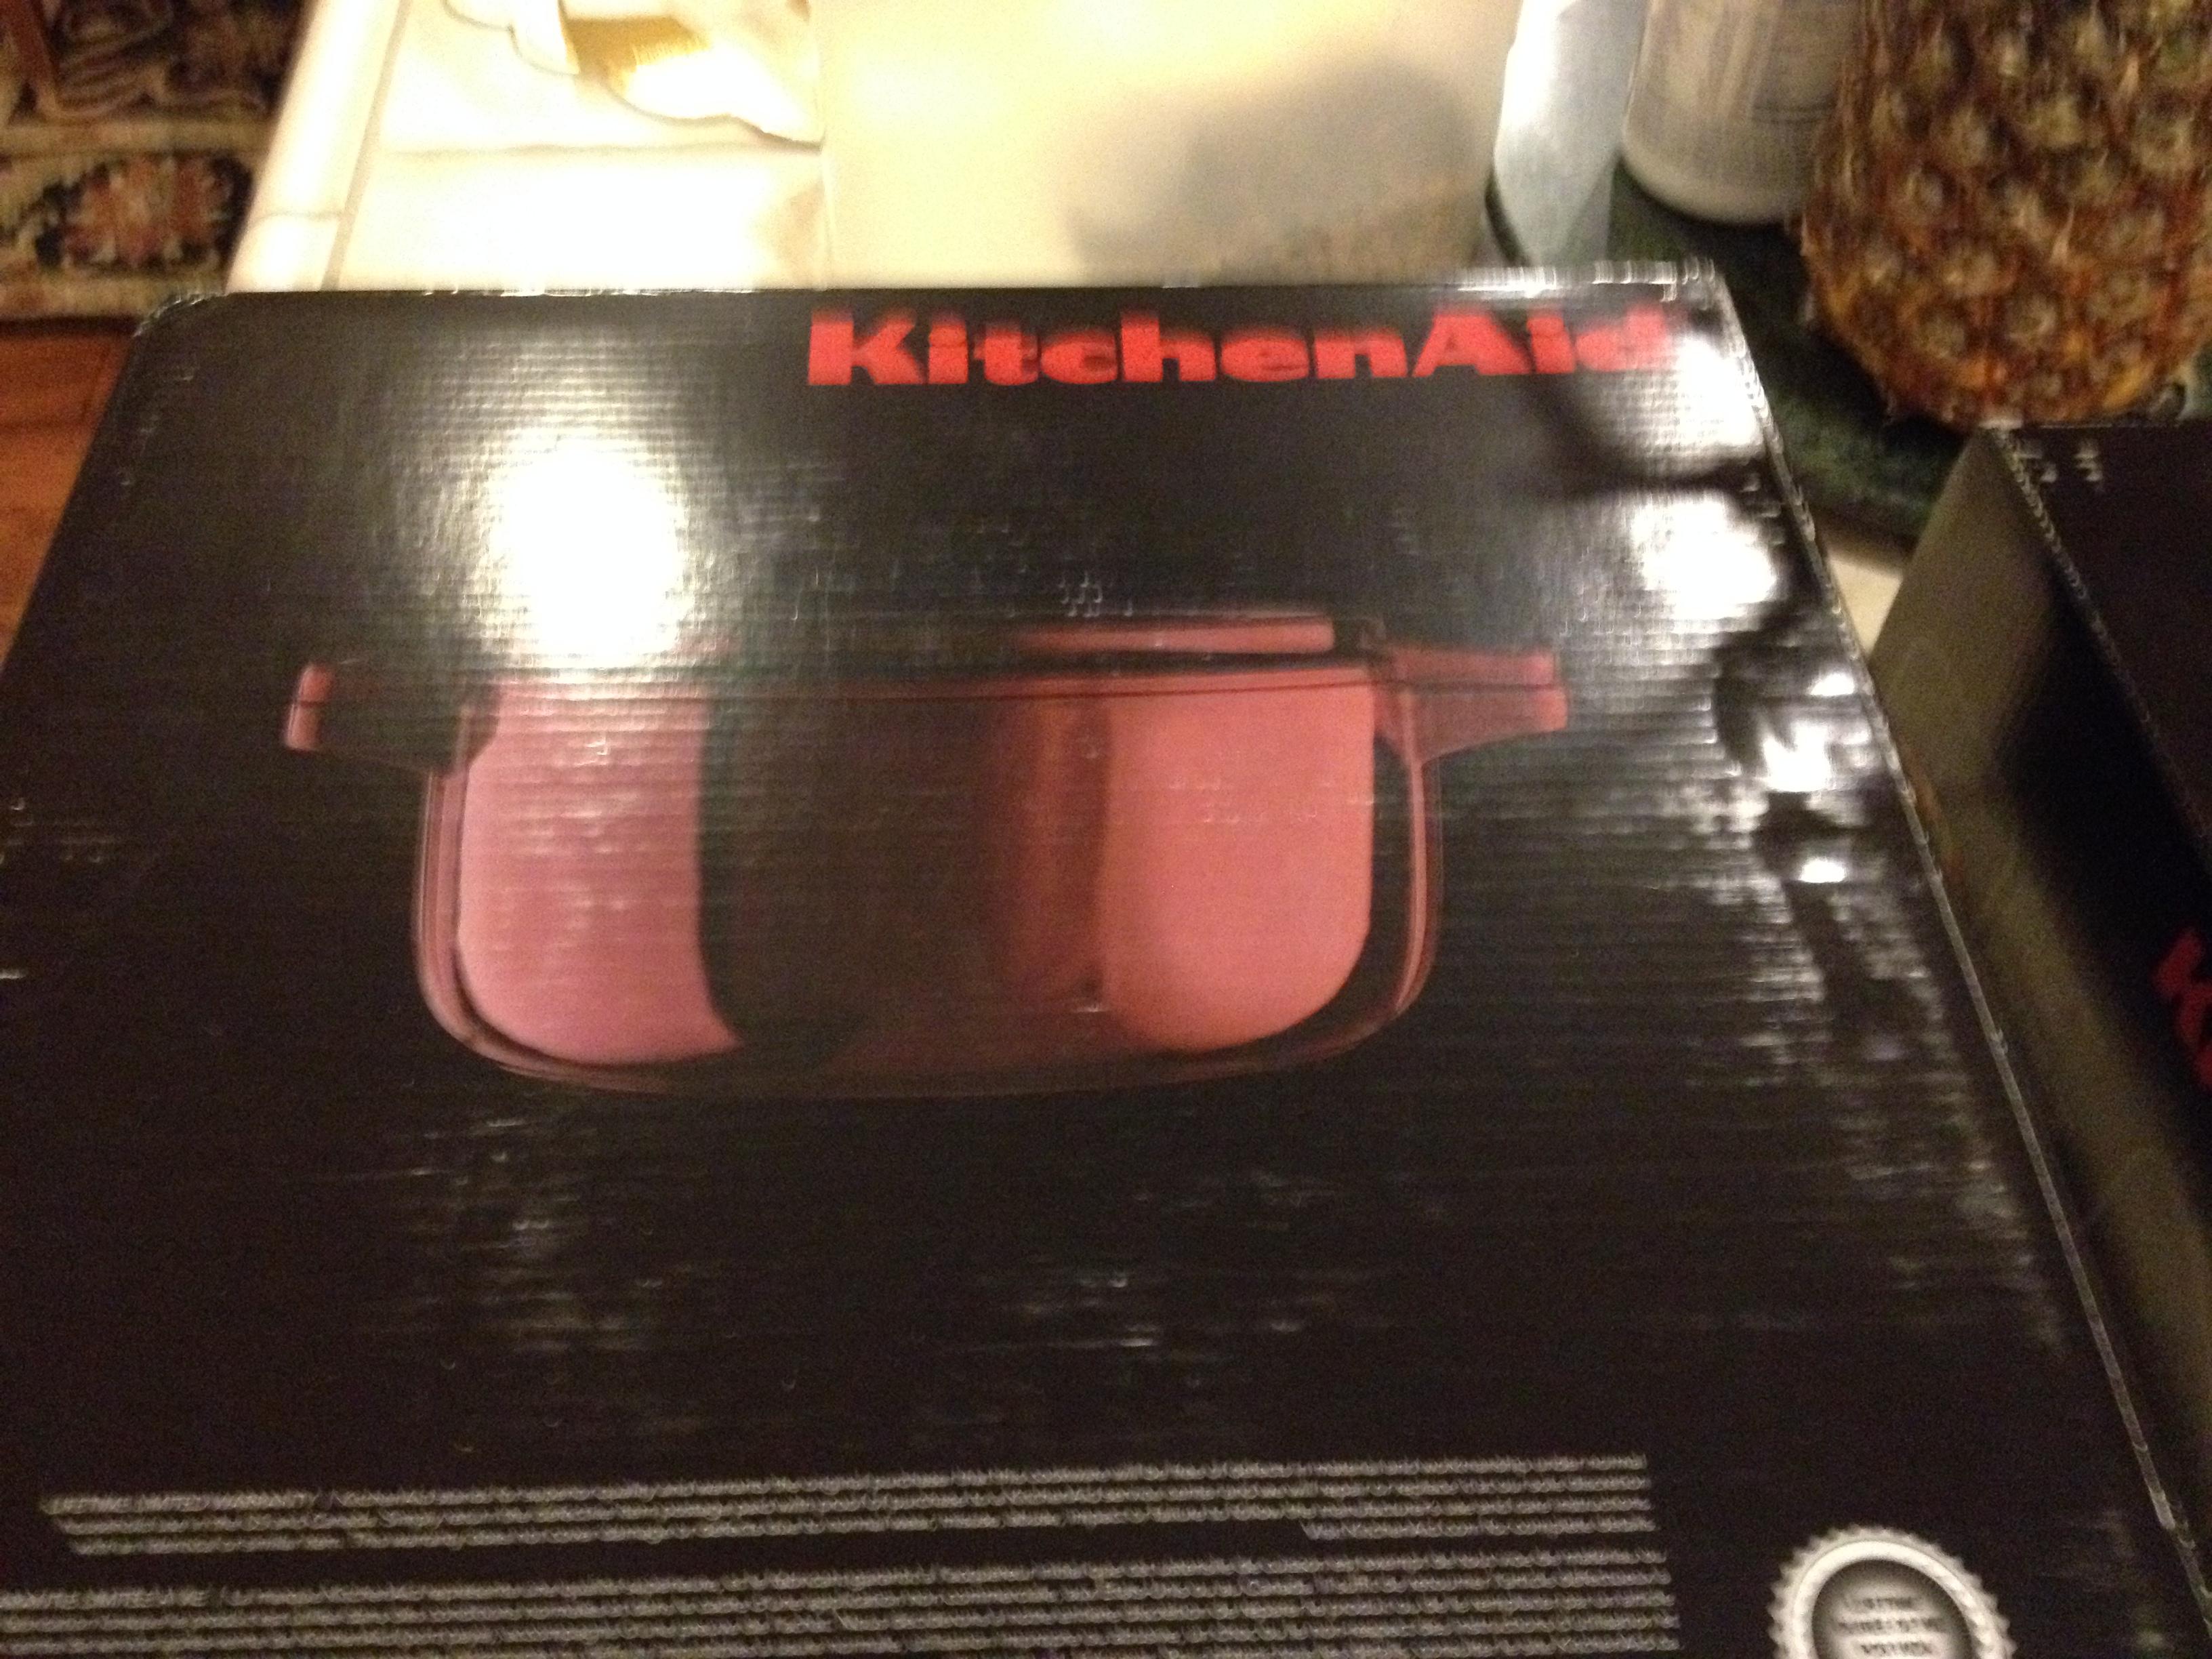 KitchenAid® Professional Cast Iron 4 Quart Casserole (maroon Color)